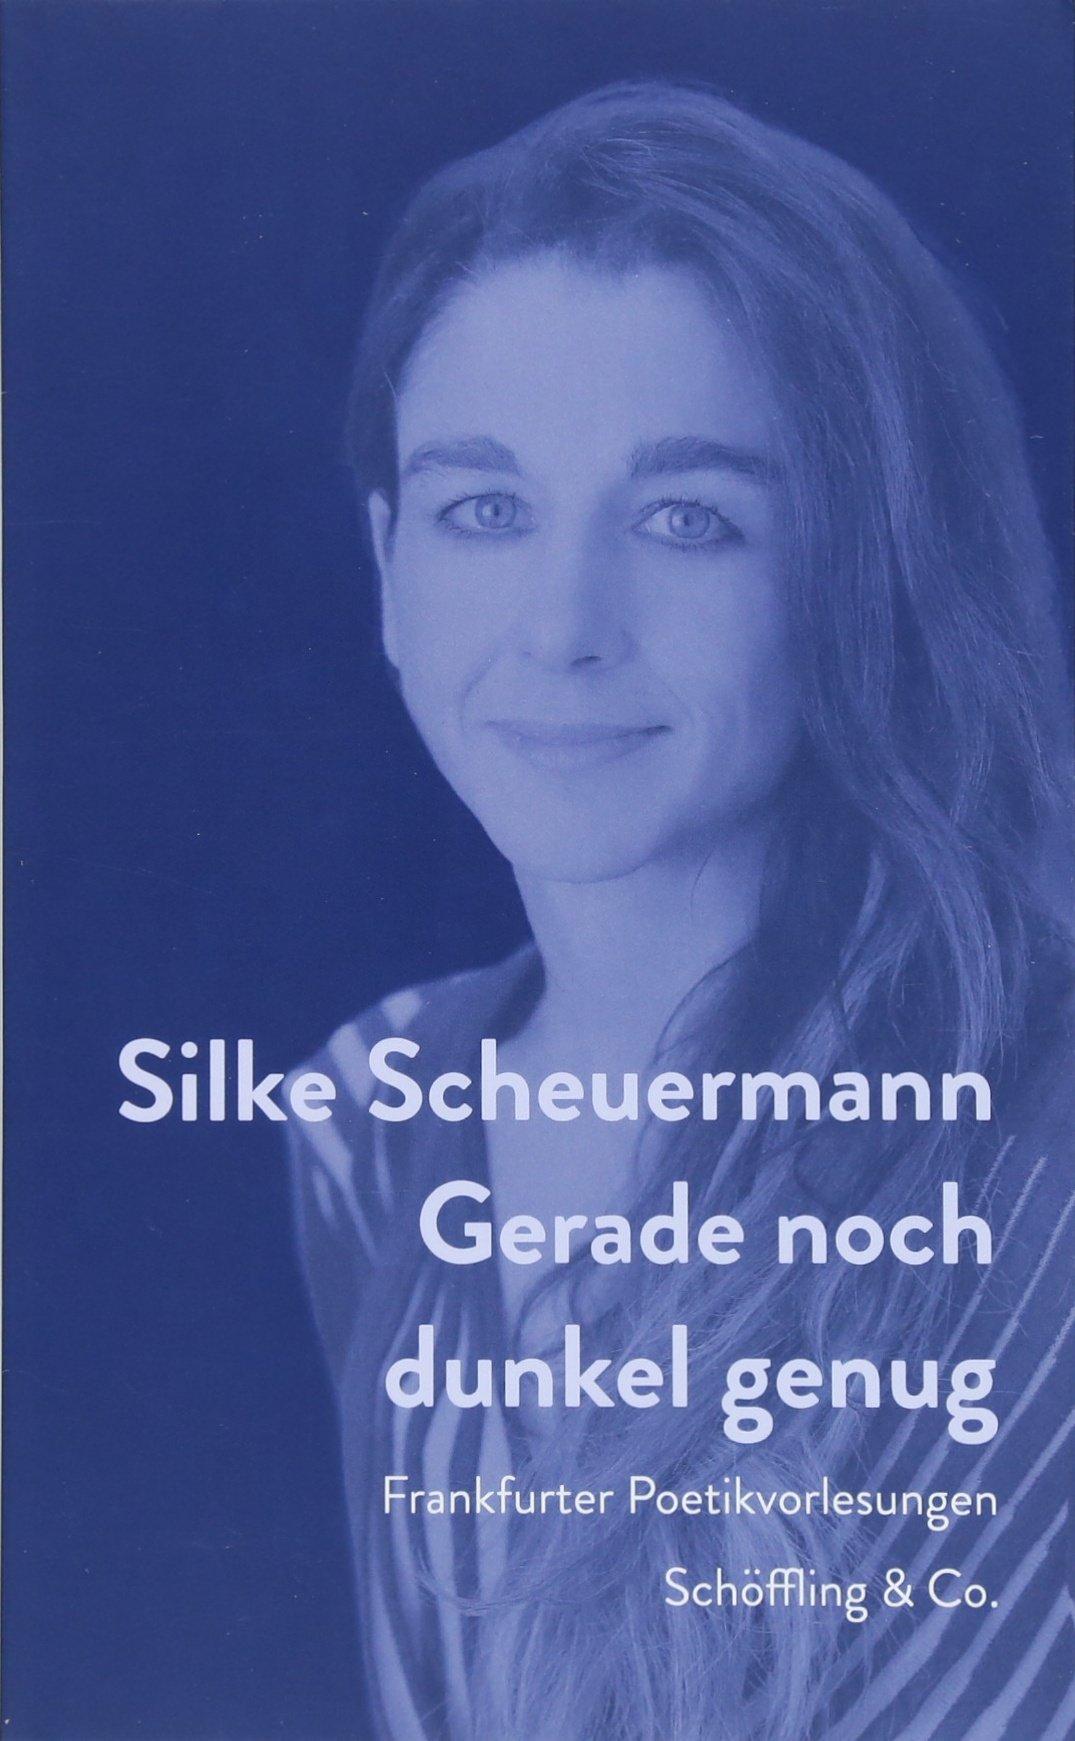 Gerade noch dunkel genug: Frankfurter Poetikvorlesungen